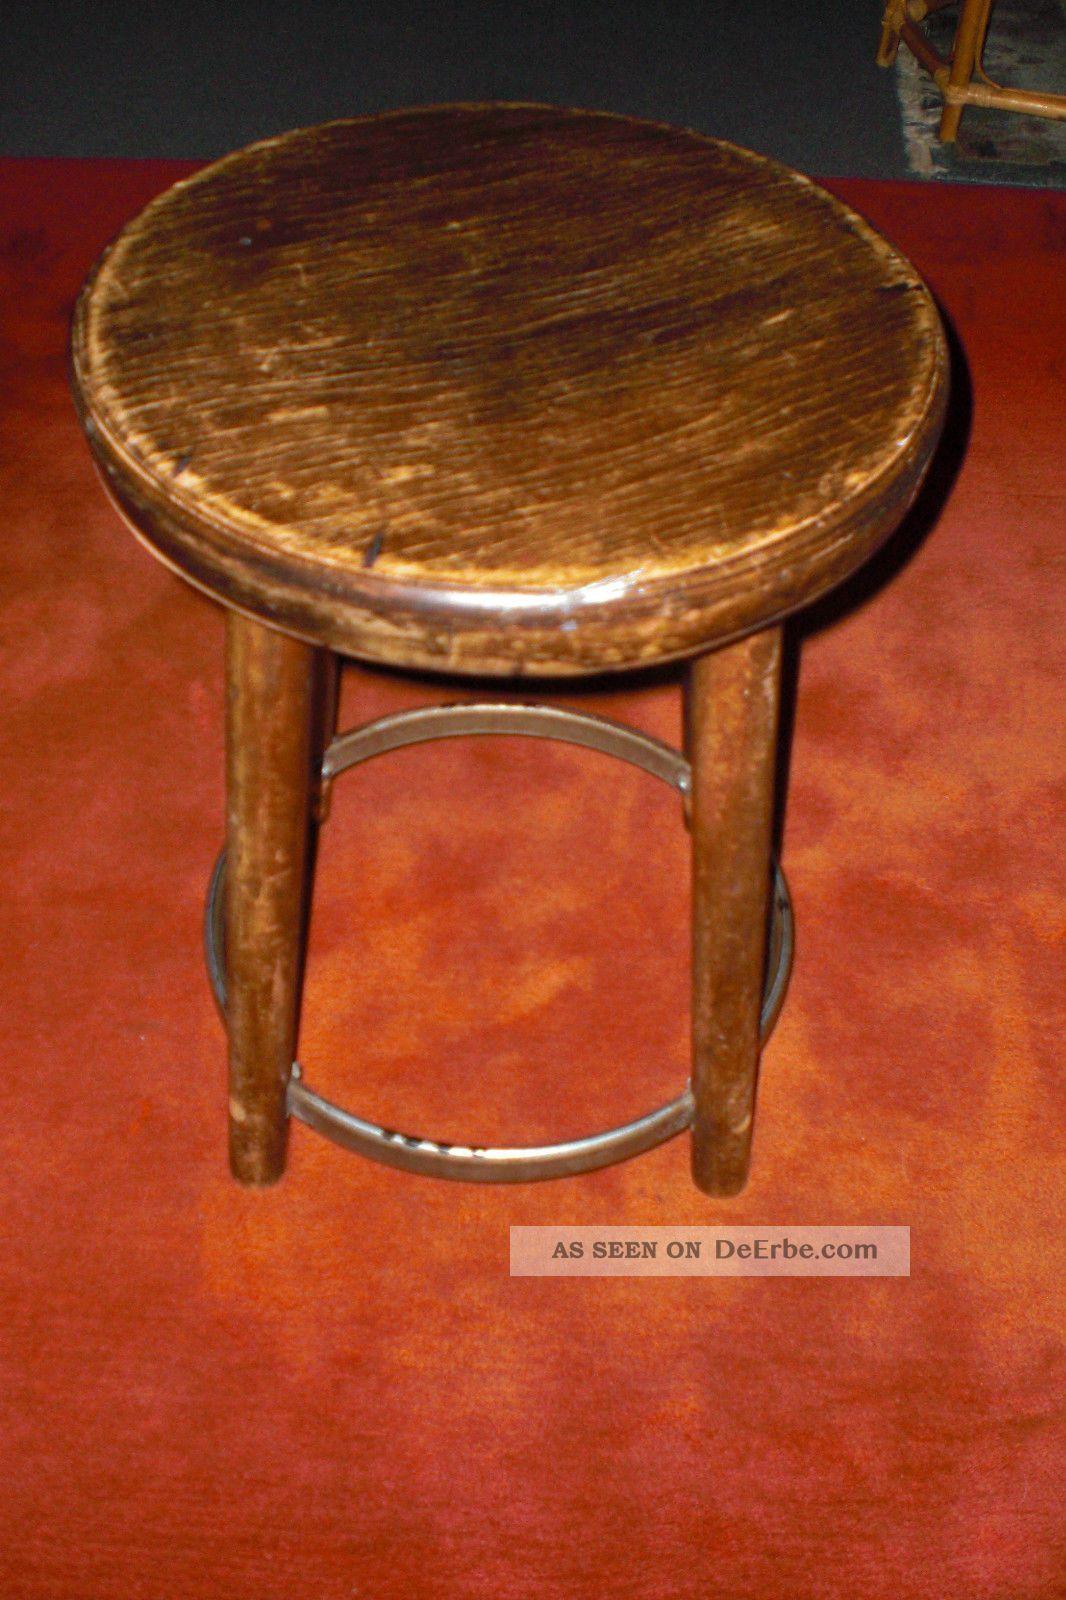 Kchenhocker Holz Cheap Interesting Barhocker Dana Hocker Kchenhocker Wei Glnzend With